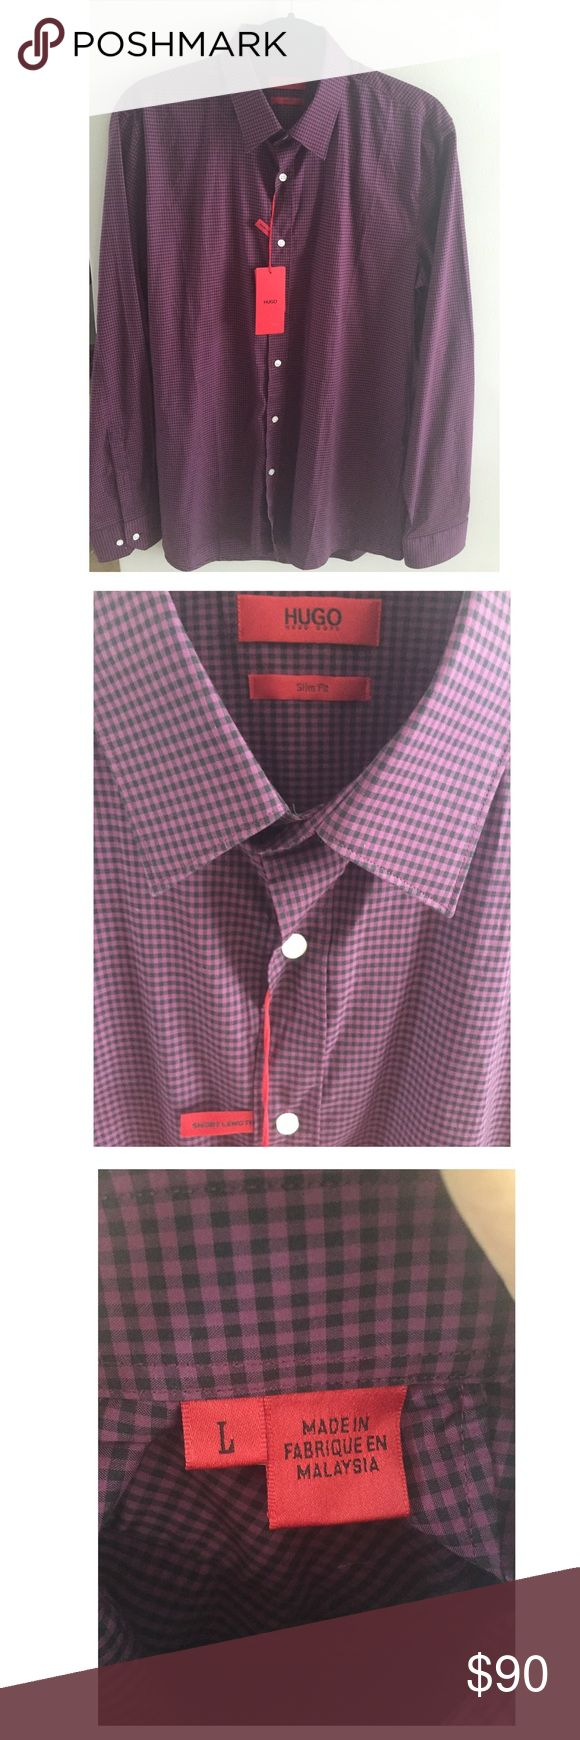 HOGO BOSS MENS SHIRT Brand new with tags...burgundy/black... Size:Large (slim FIT) (short Length) Hugo Boss Other